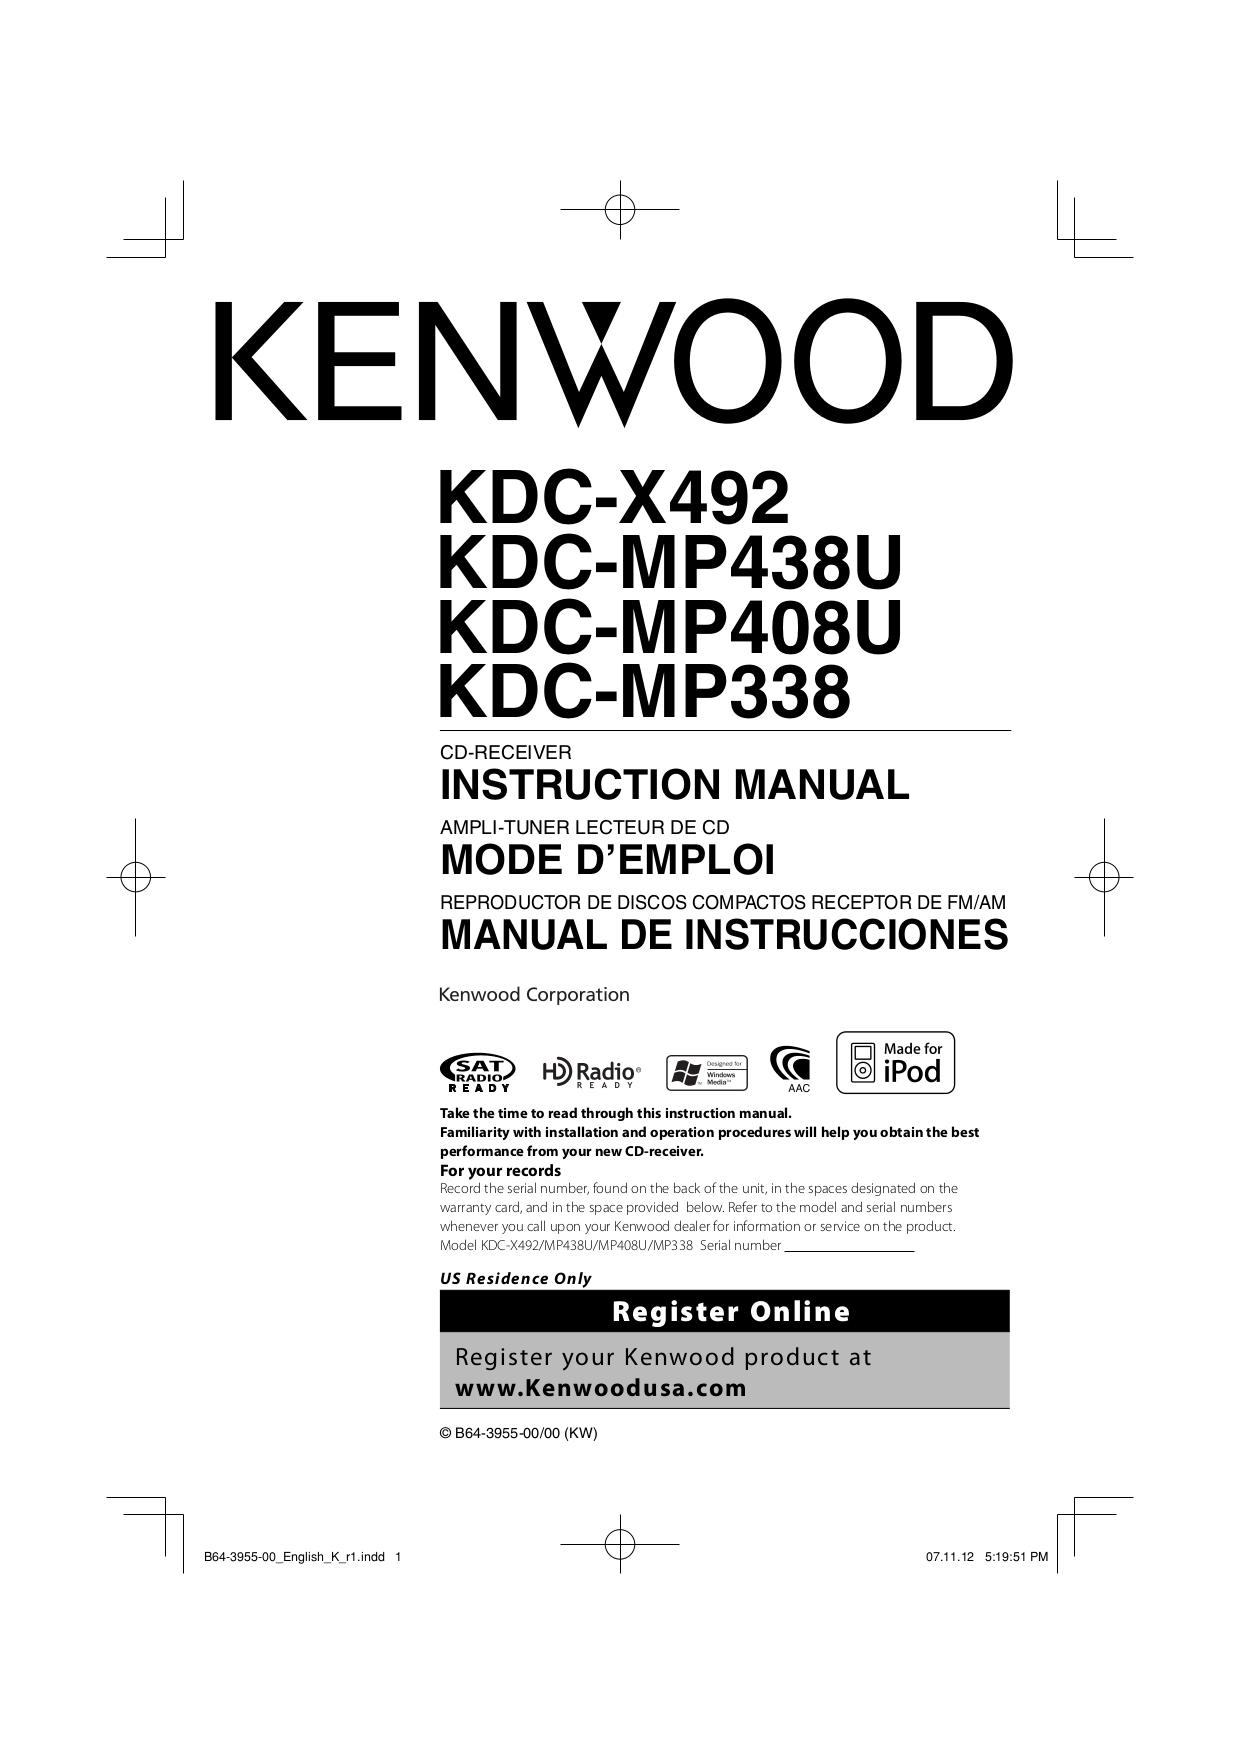 kenwood kdc bt838u manual daily instruction manual guides u2022 rh testingwordpress co kdc-bt838u manual